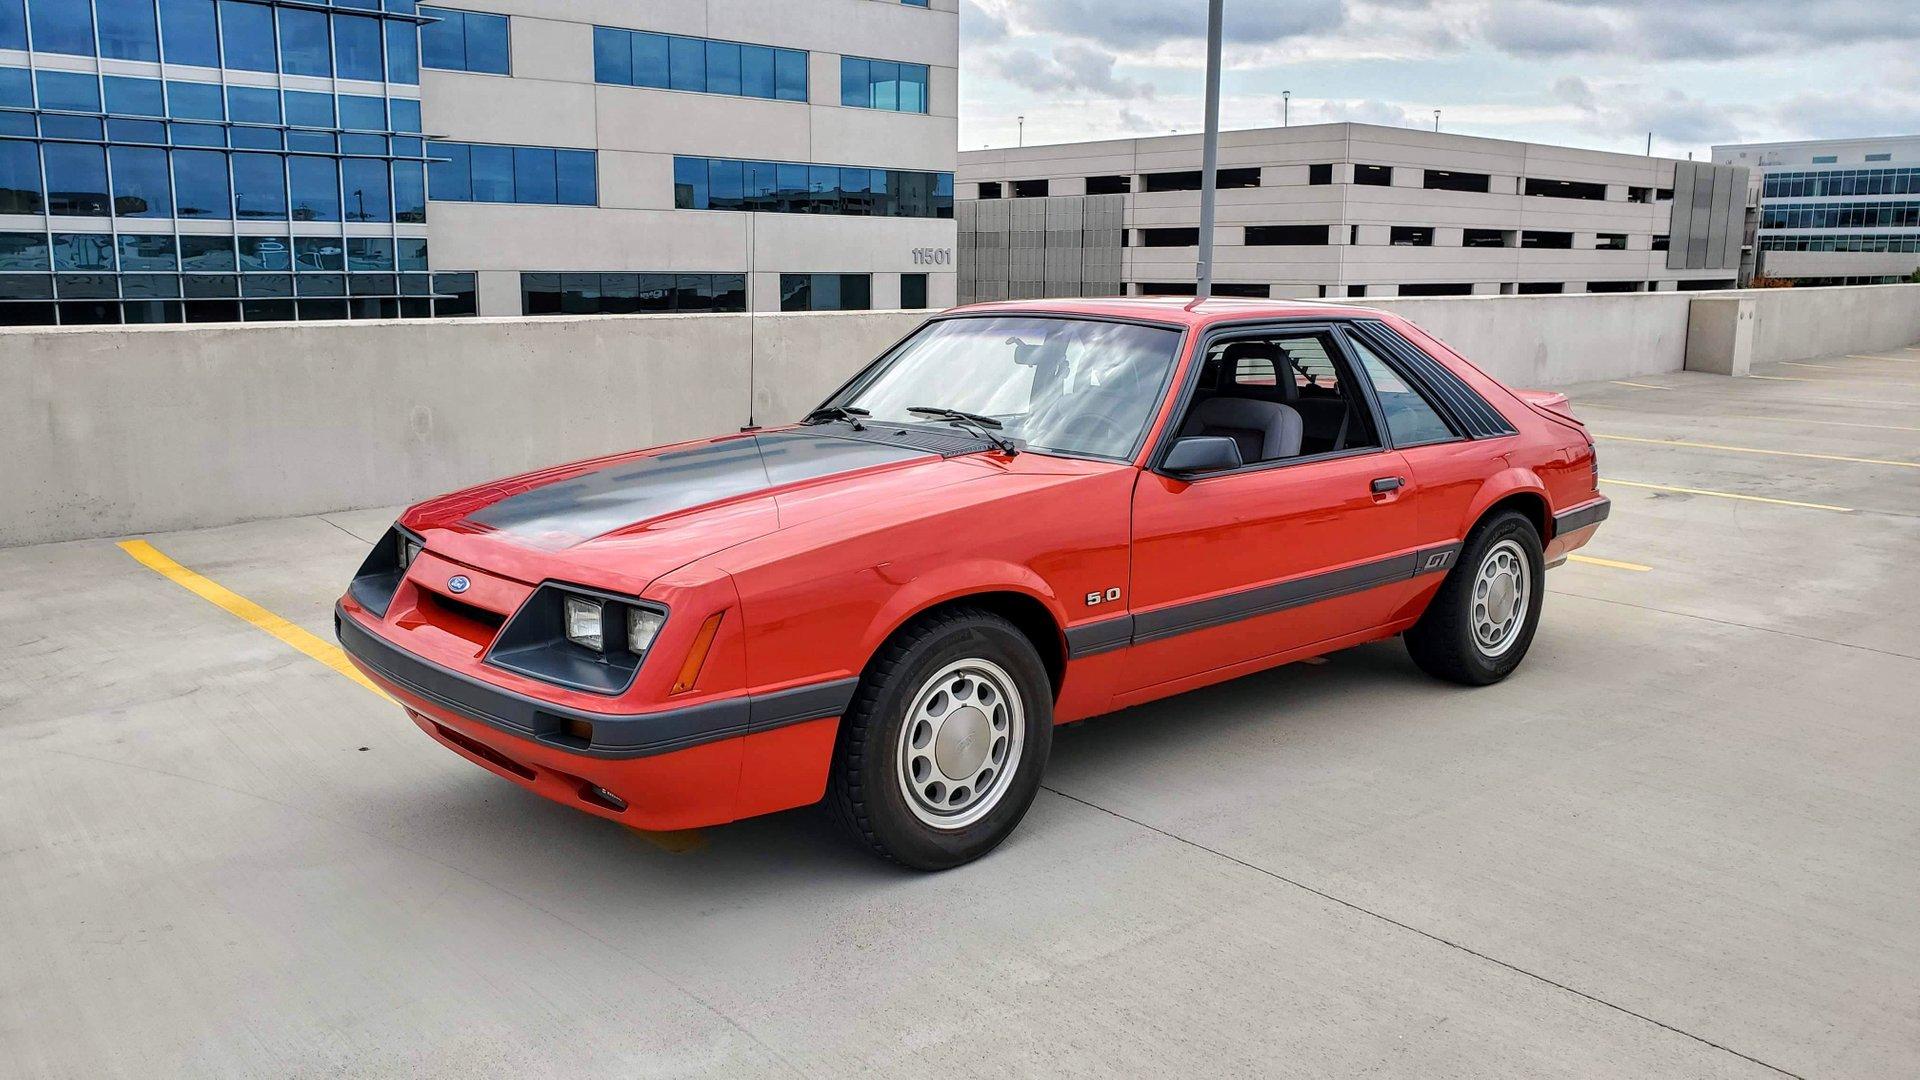 1986 Mustang Colors